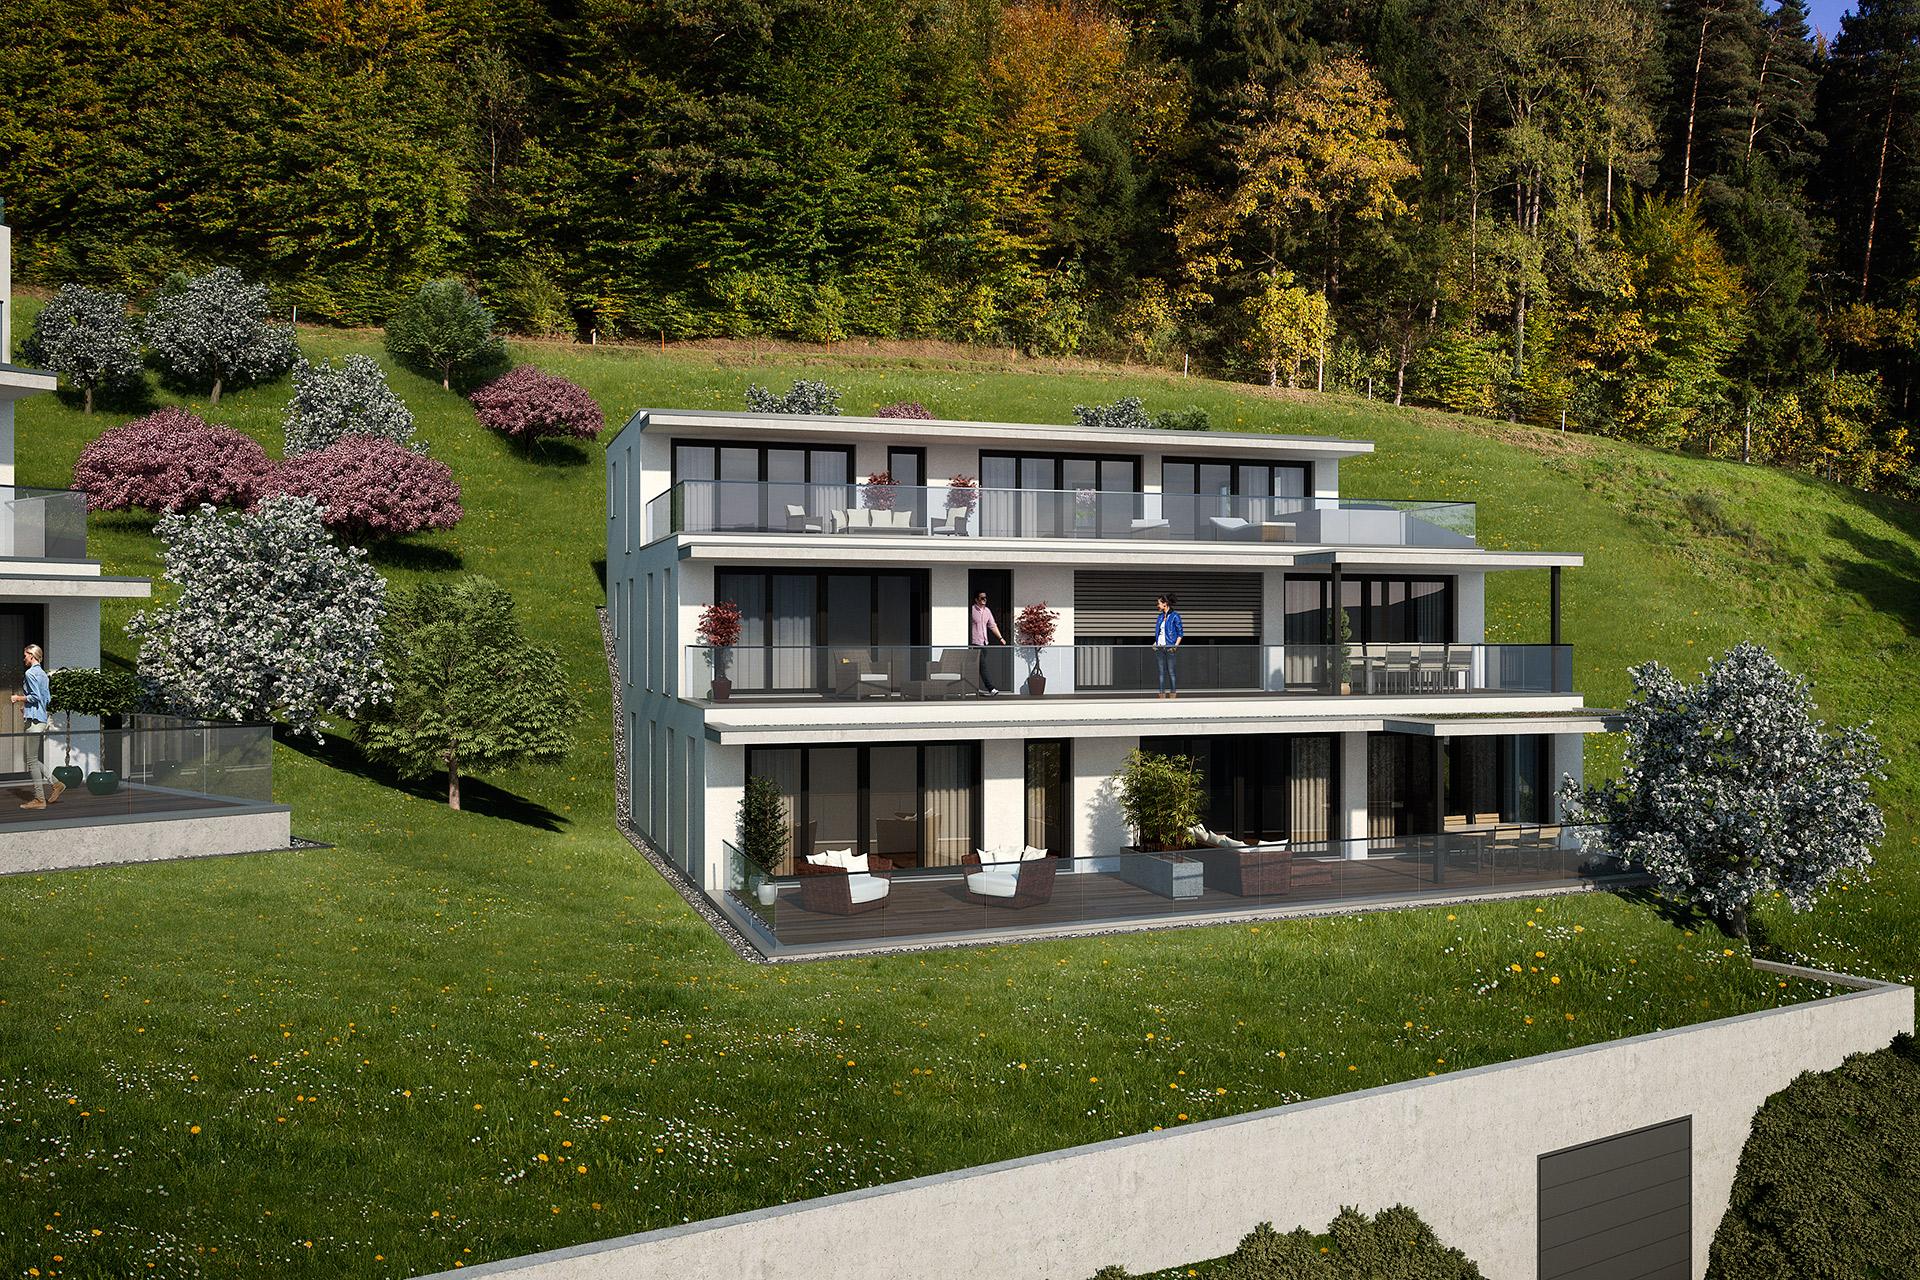 Terrassenhaus «Sunnehügel Hushalden» Dussnang